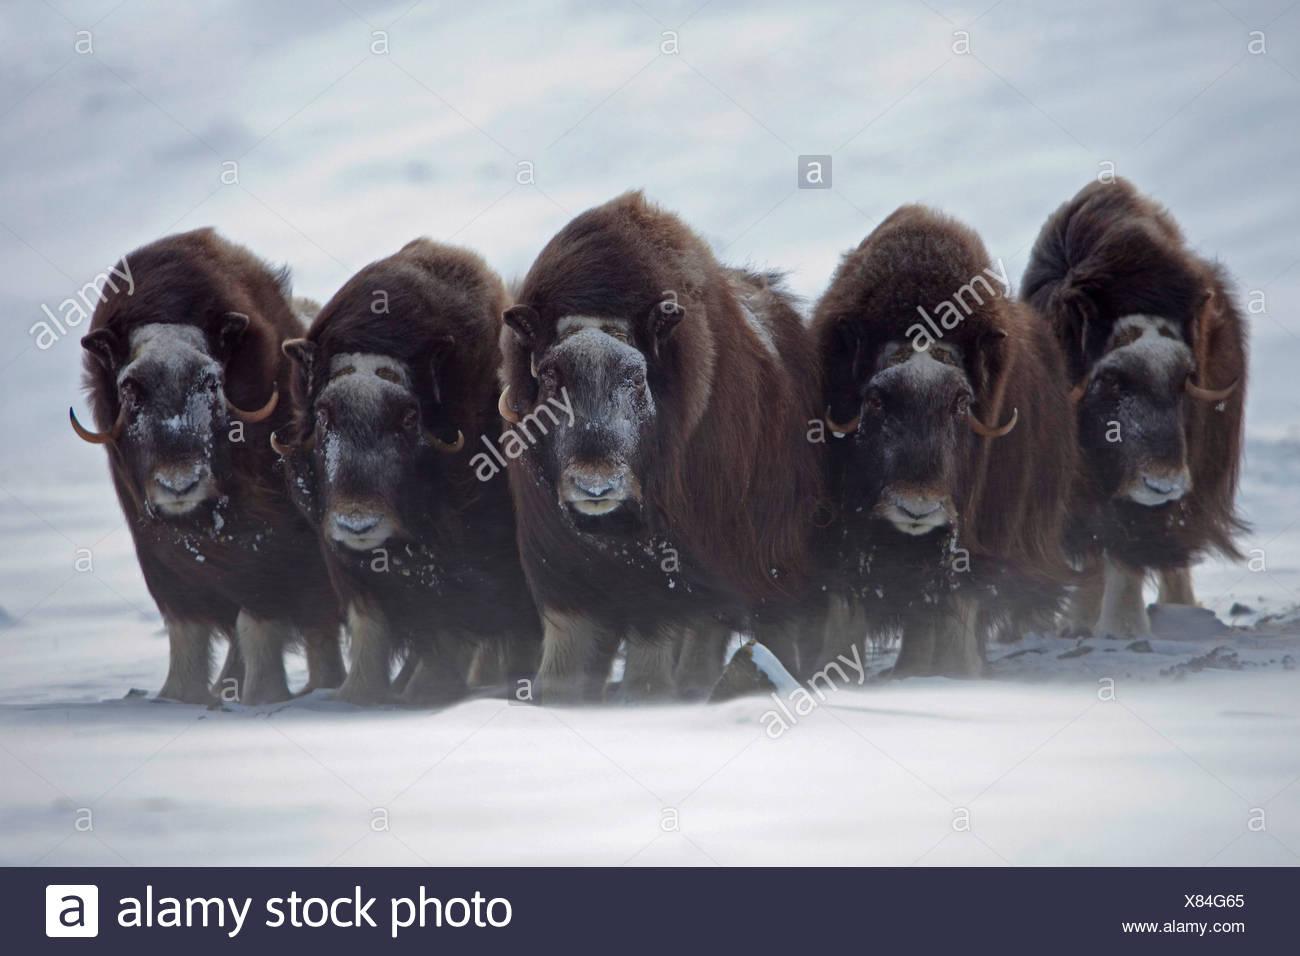 muskox (Ovibos moschatus), herd at stormy weather , Norway, Dovrefjell Sunndalsfjella National Park - Stock Image